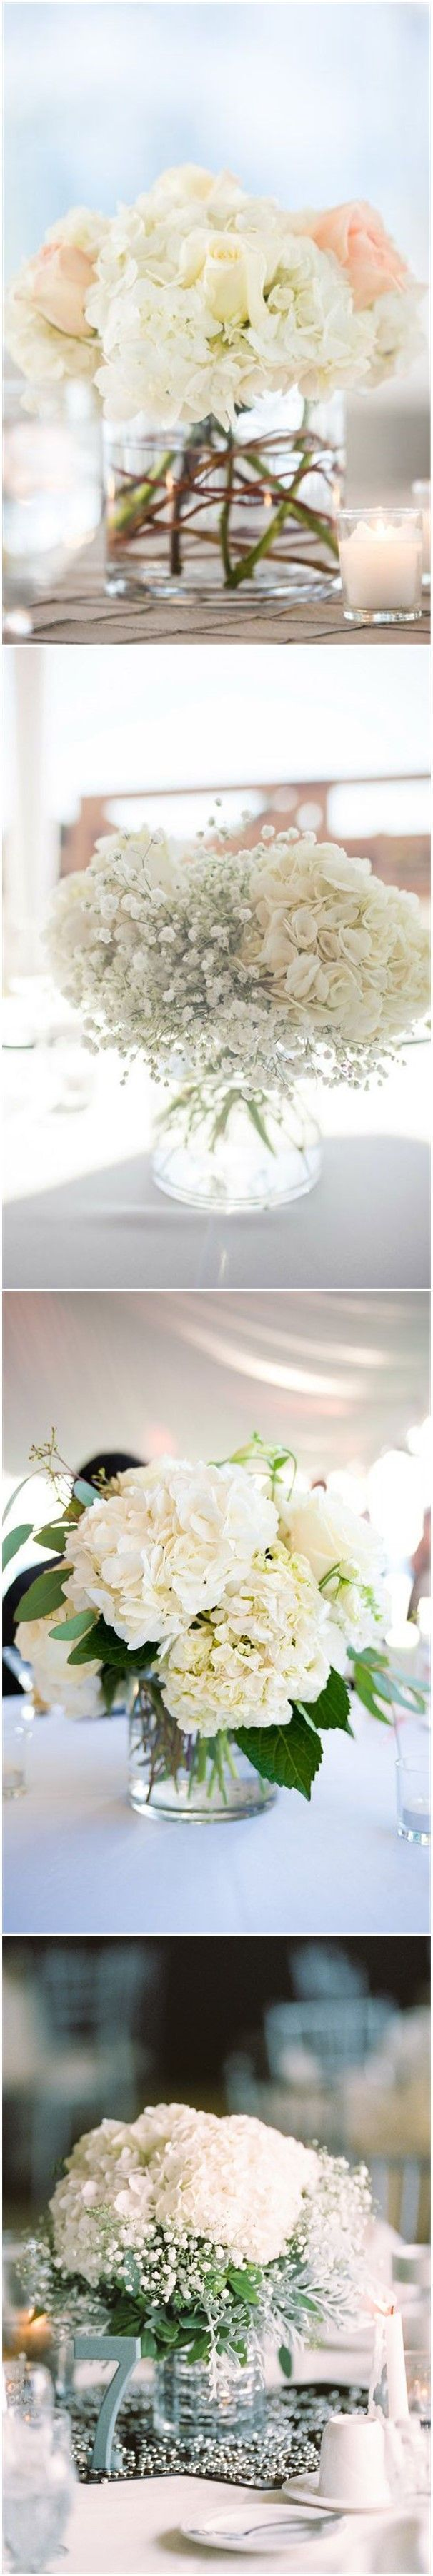 100+ best Wedding Centerpieces images by Le Jardin on Pinterest ...